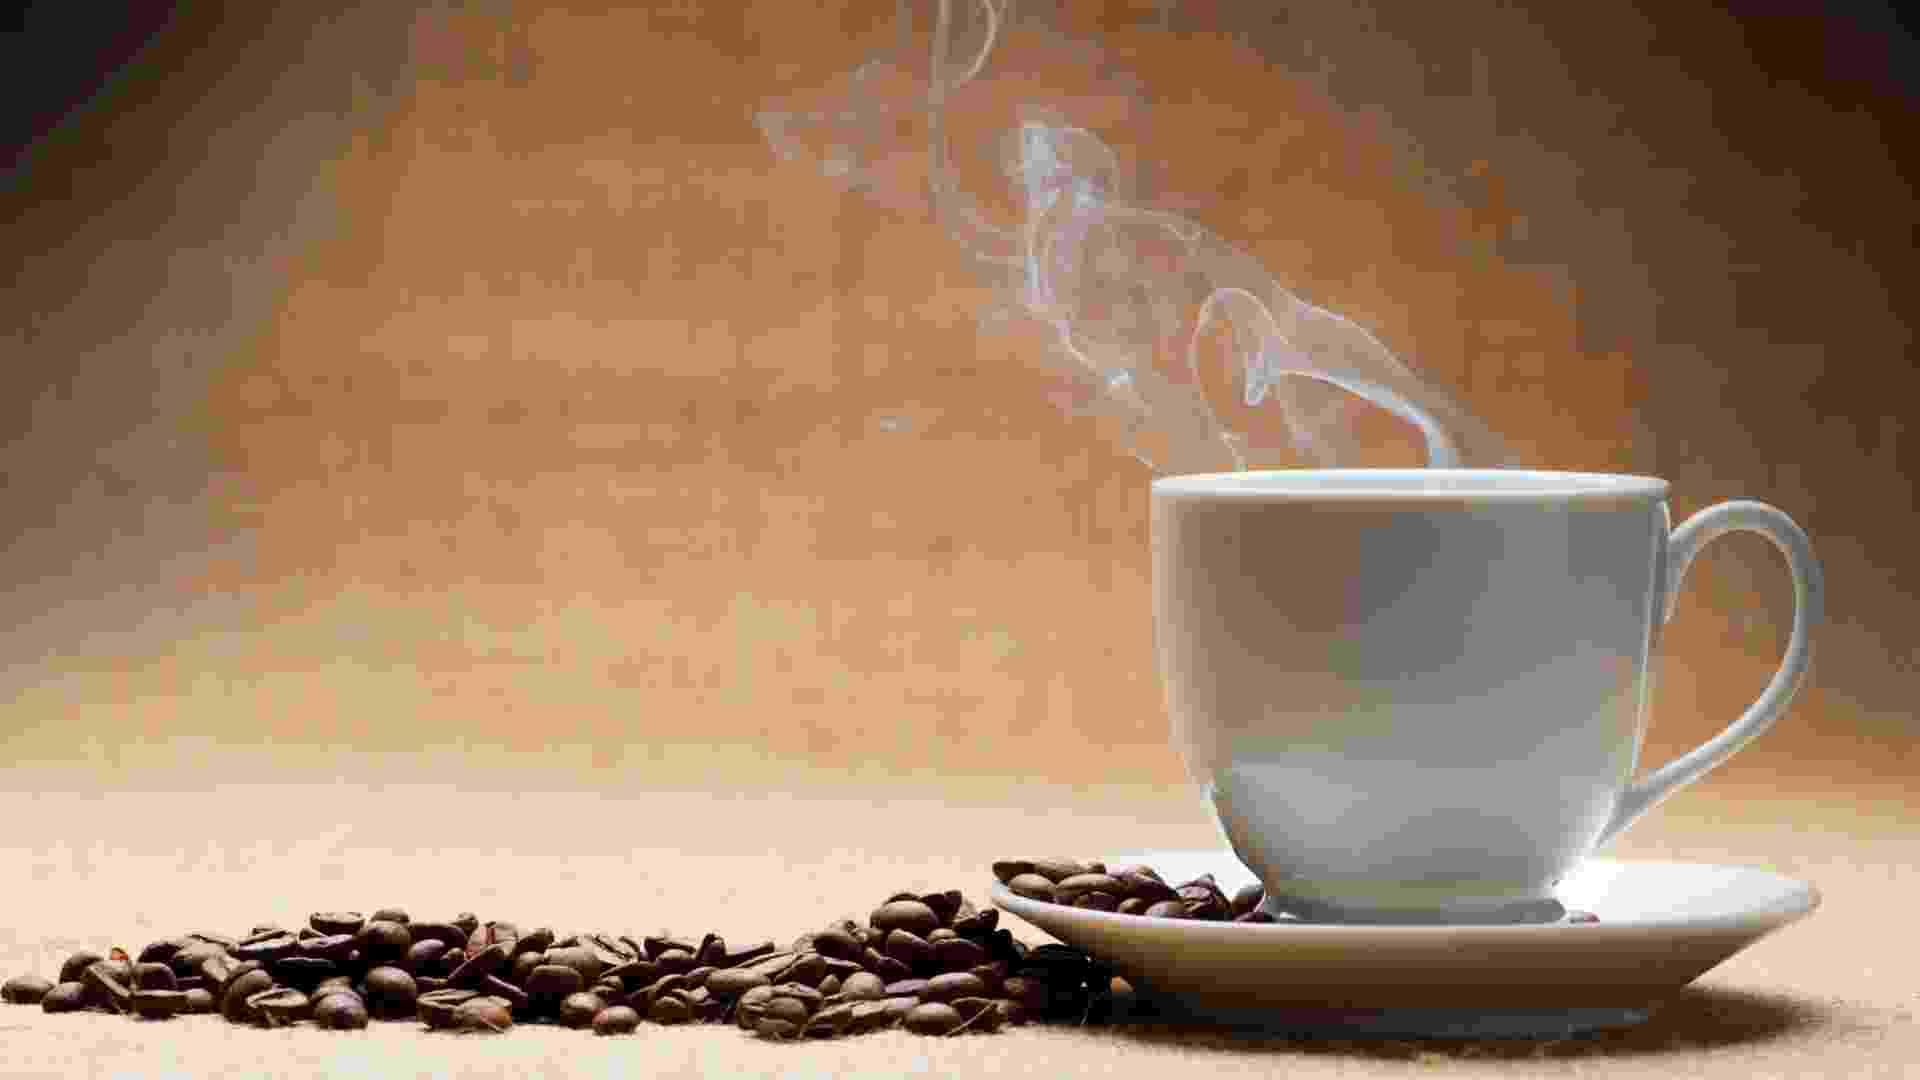 Café - Thinkstock